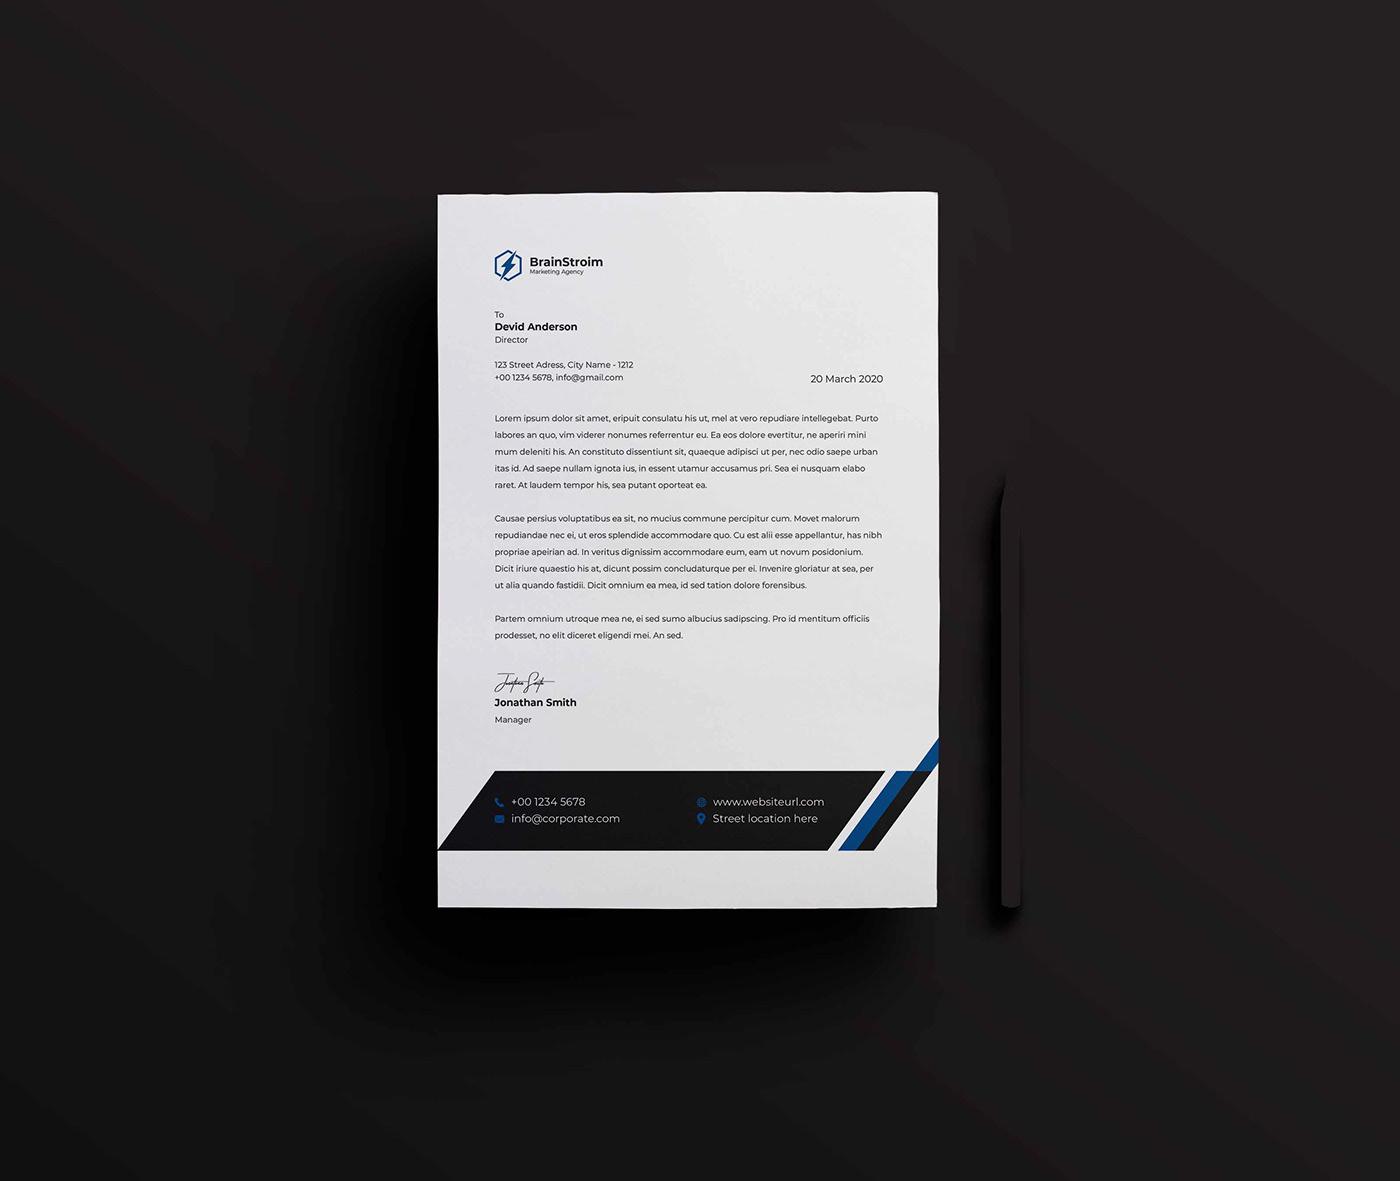 Image may contain: computer and print